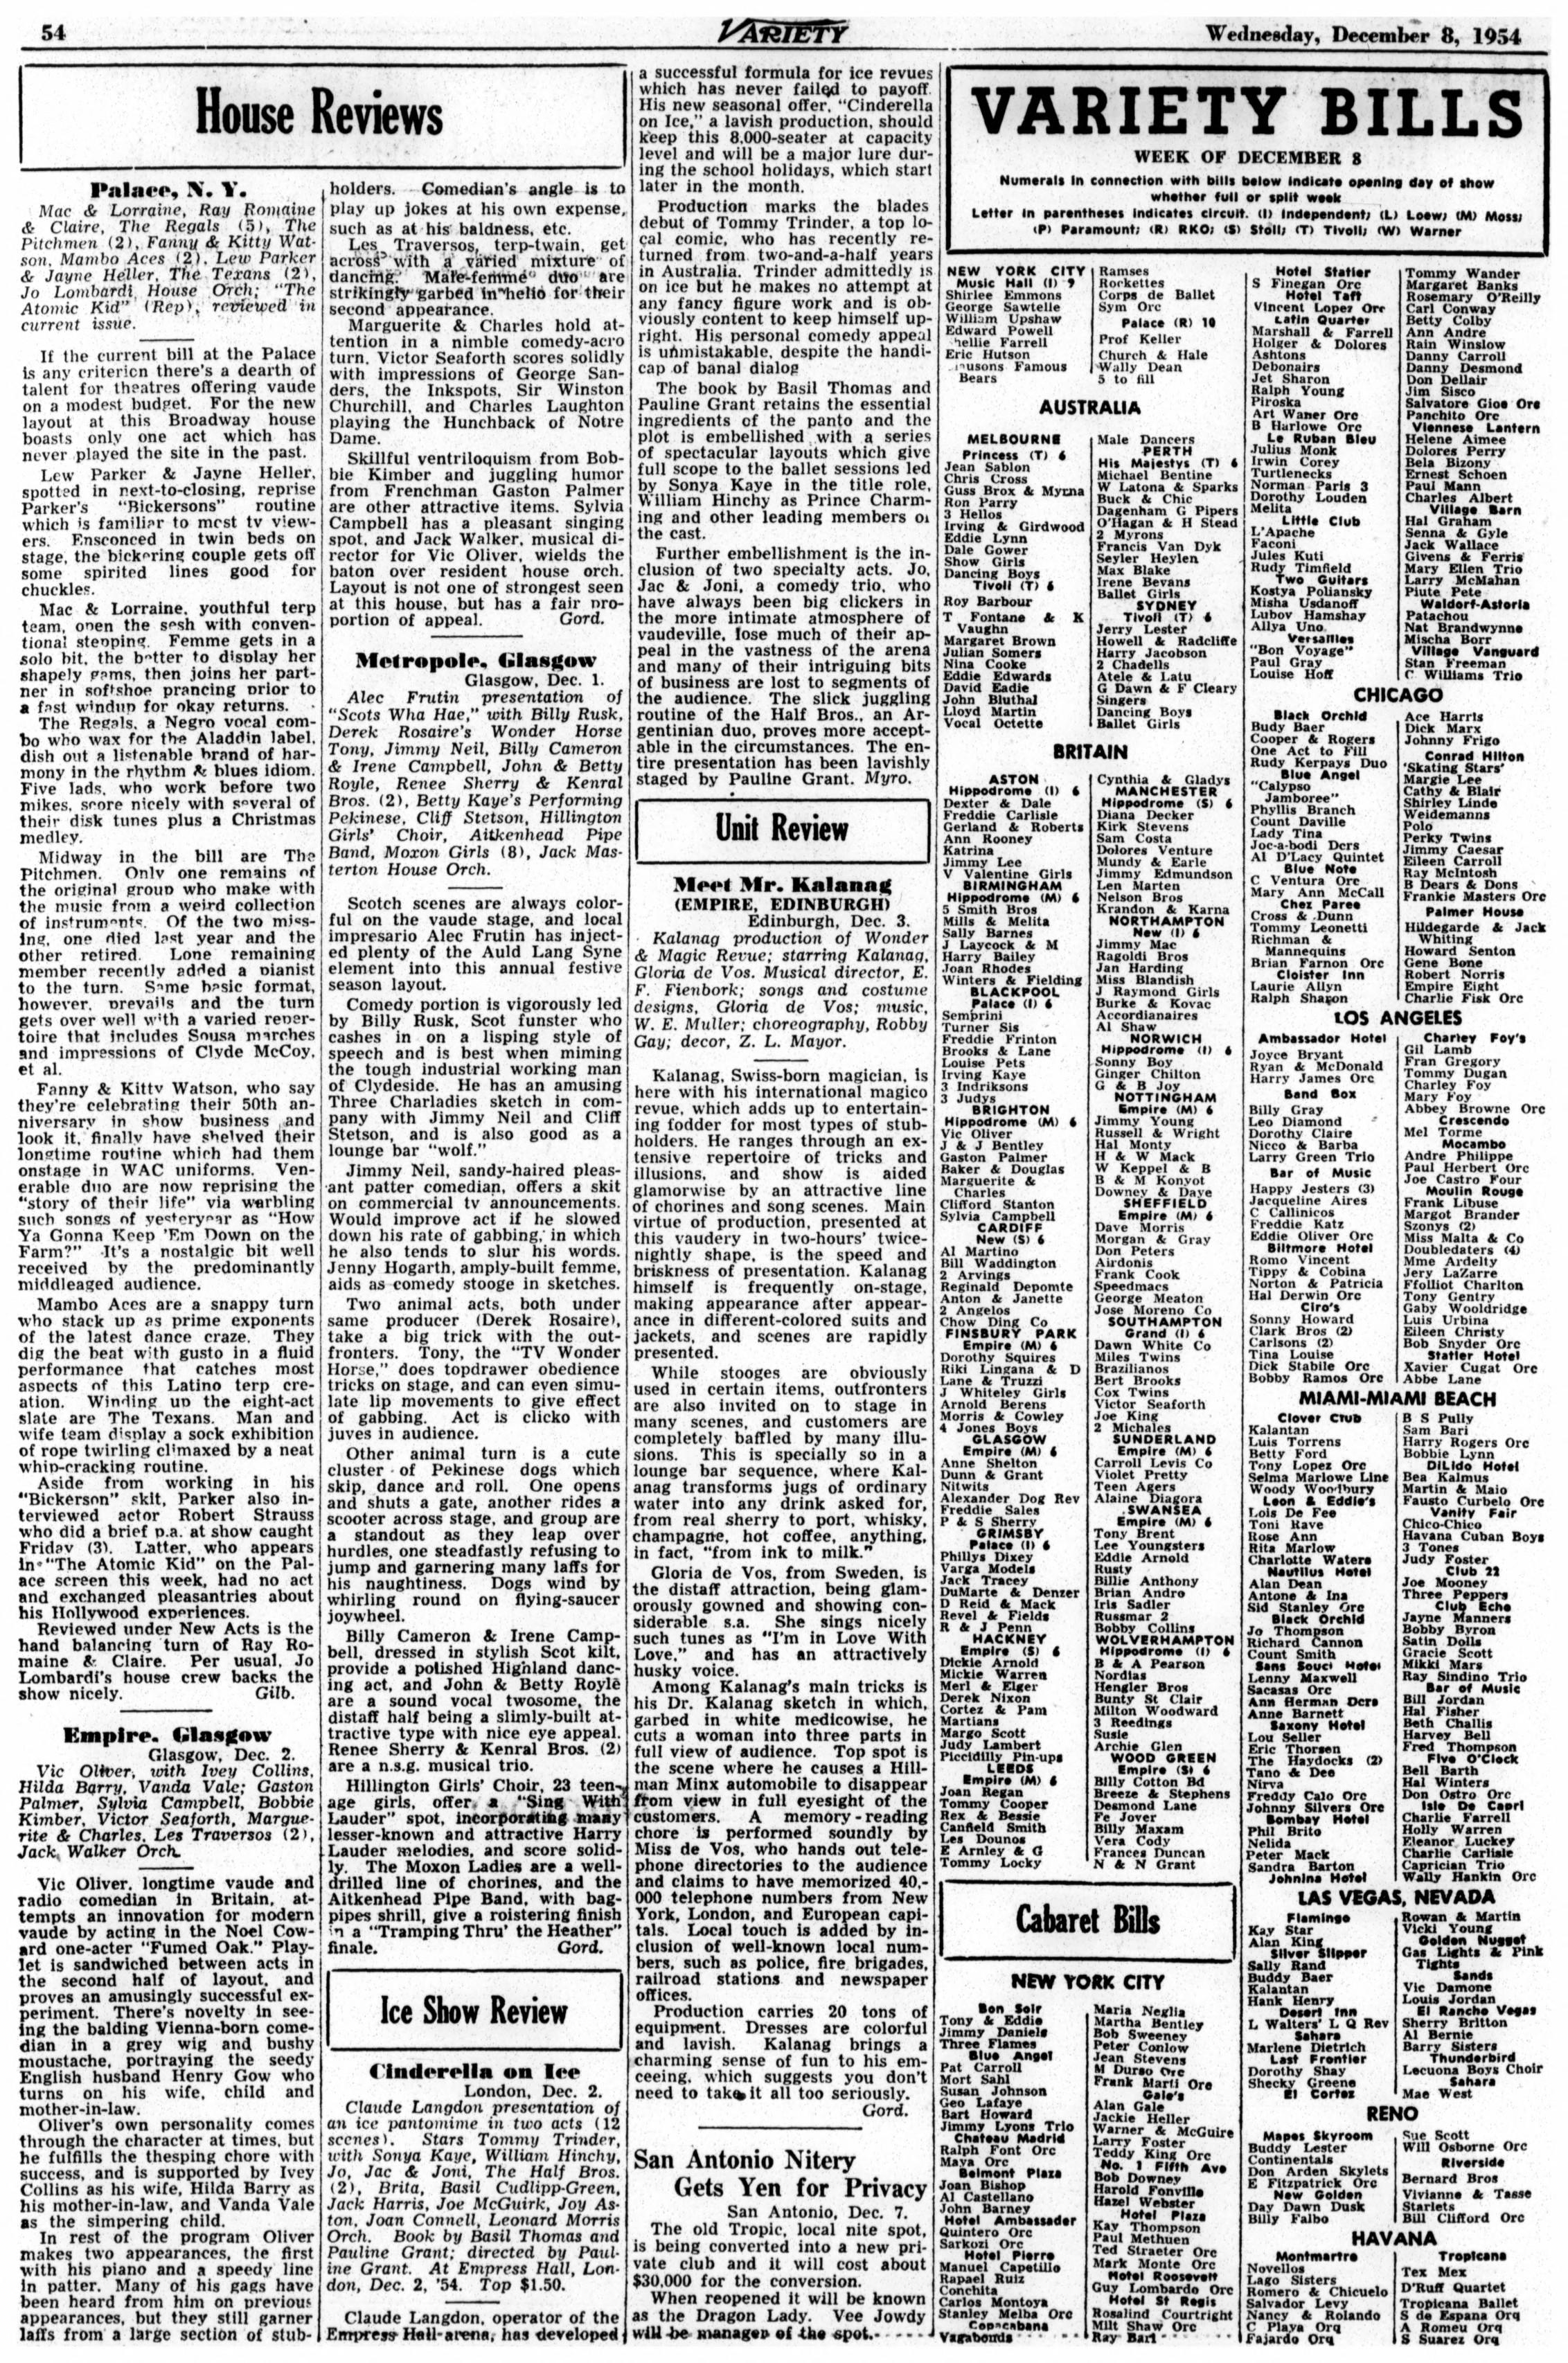 Variety196-1954-12_jp2.zip&file=variety196-1954-12_jp2%2fvariety196-1954-12_0133